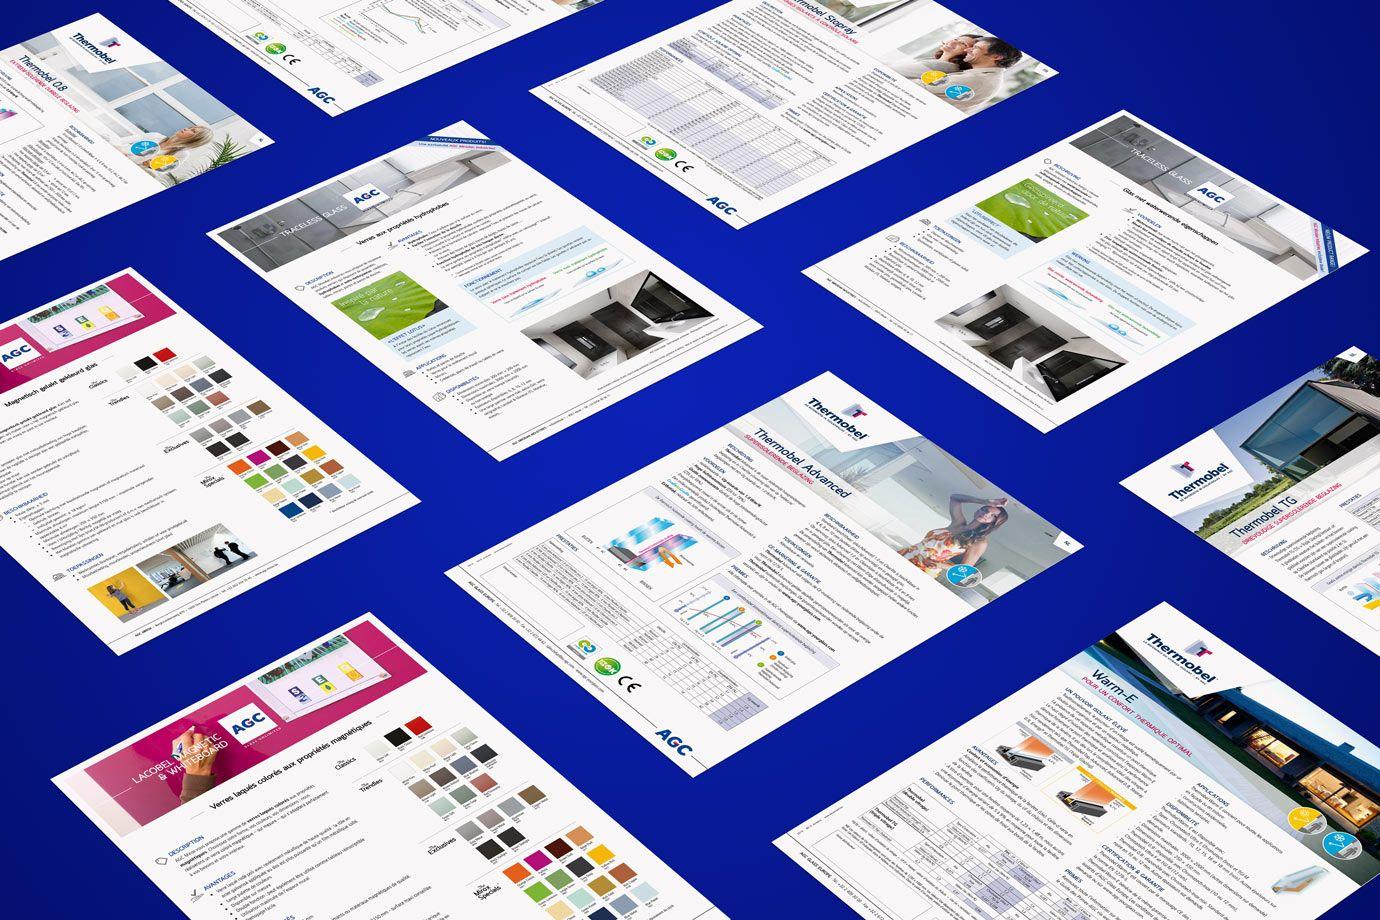 Productleaflets AGC